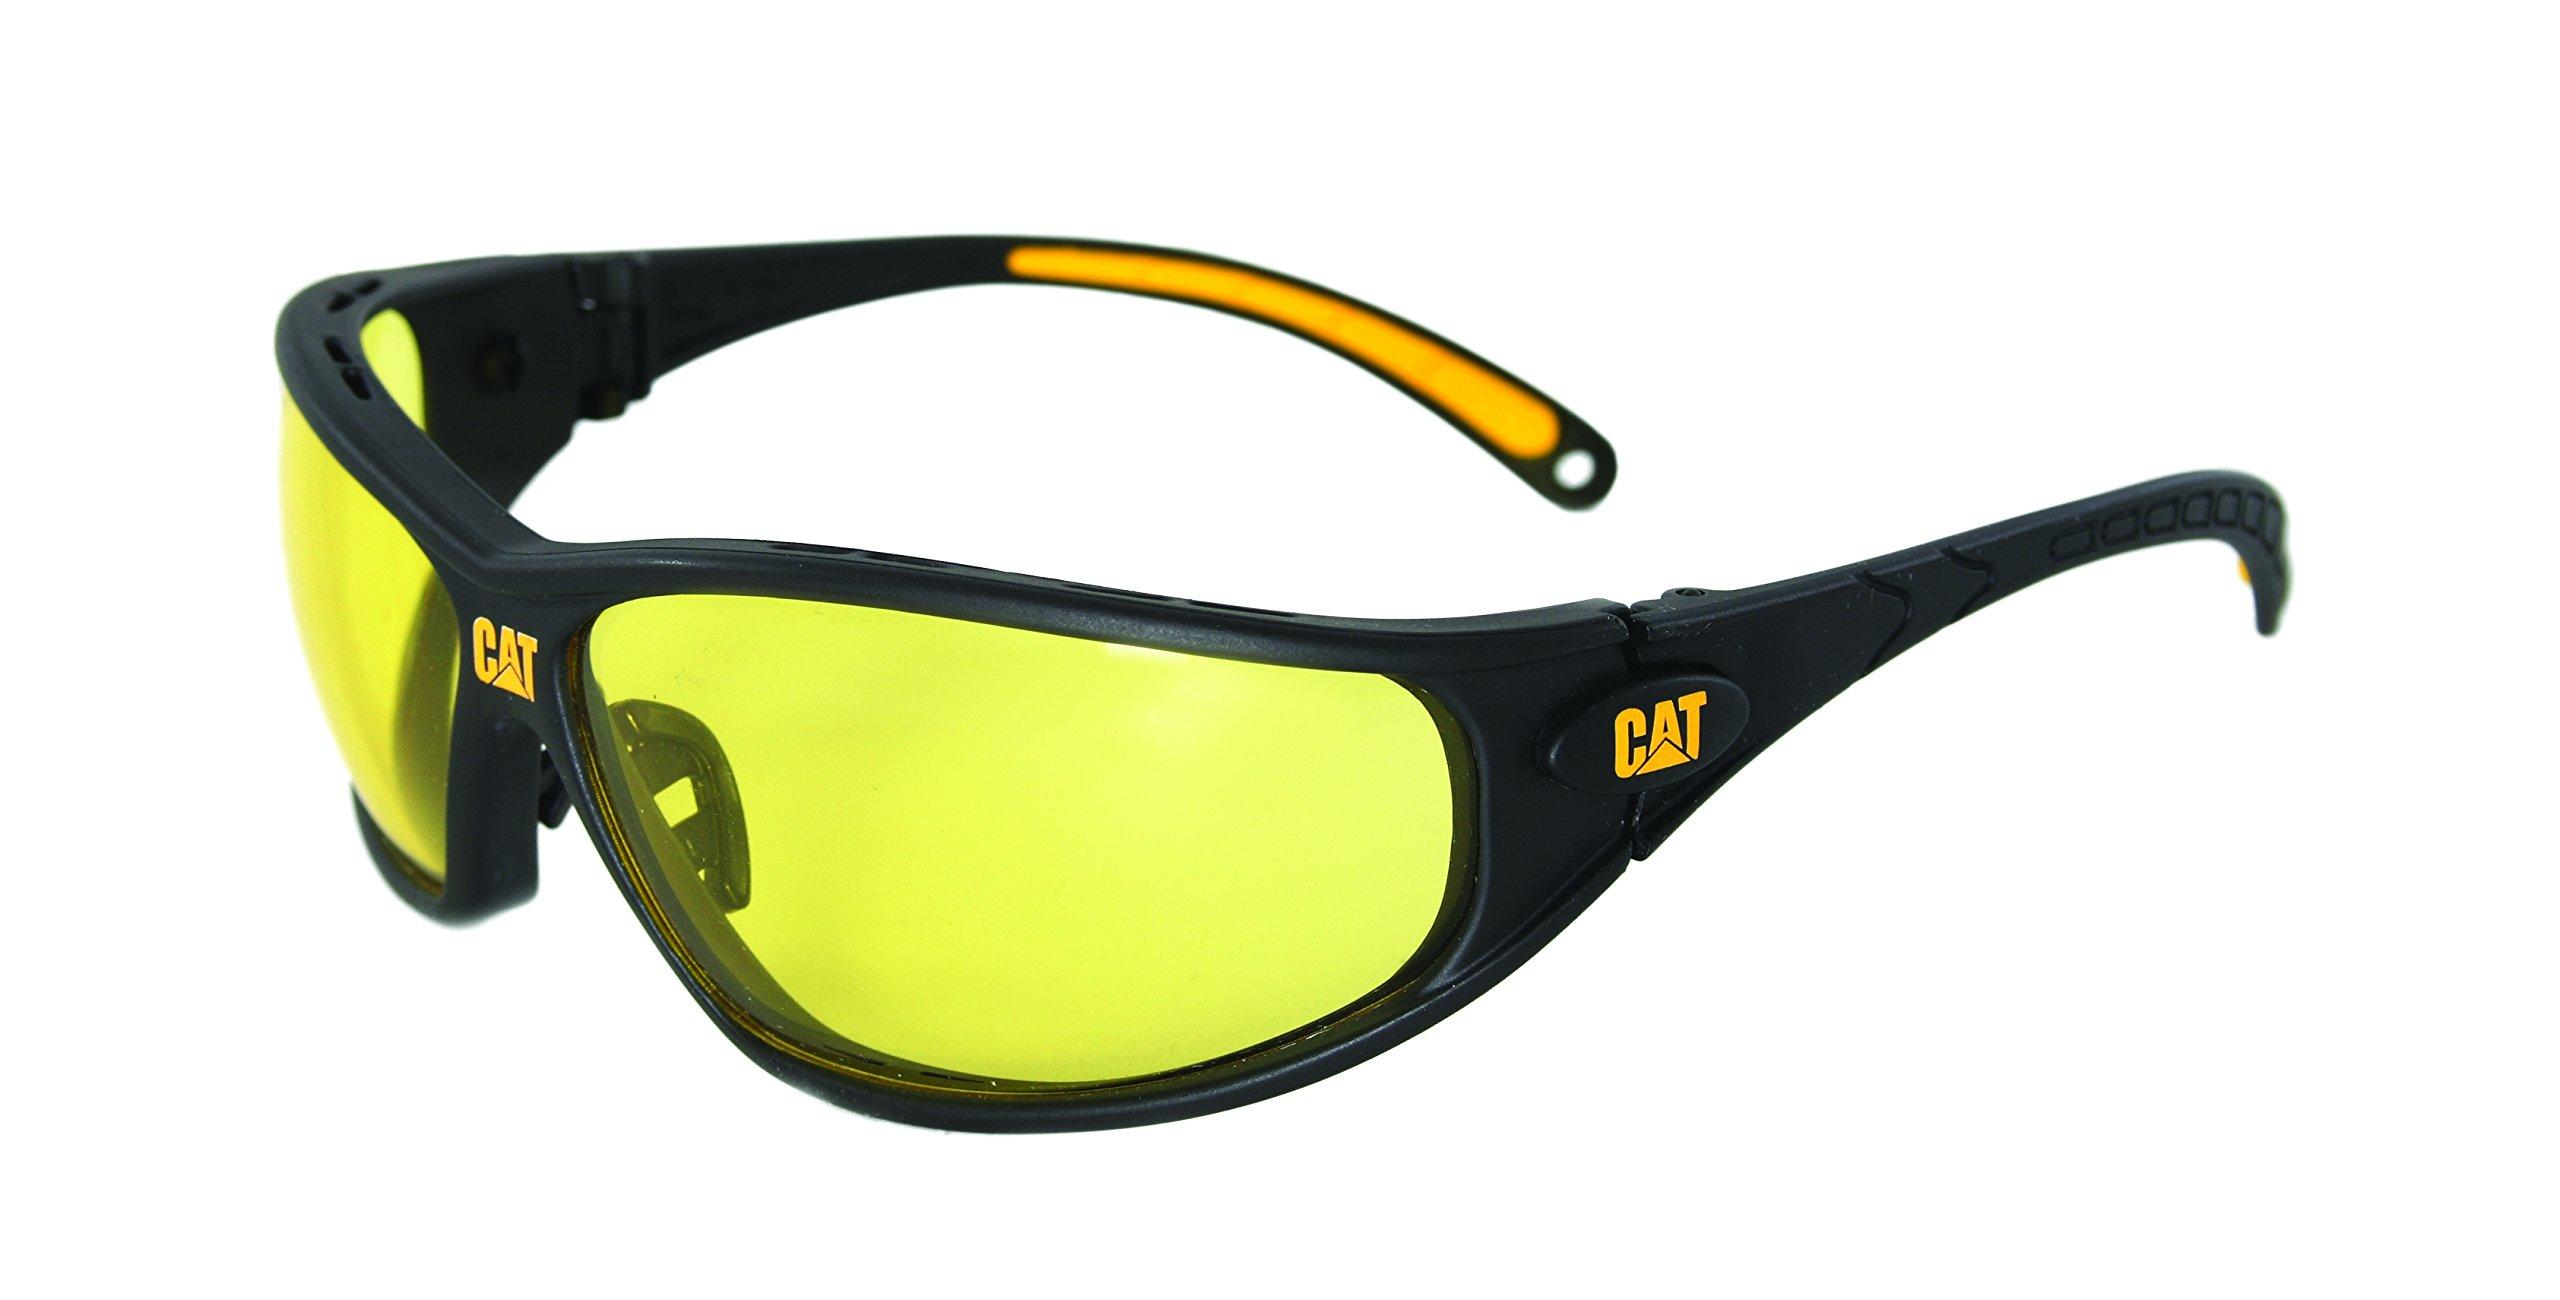 CAT Caterpillar Track Protective Eyewear Adjustable Mens Safety Glasses